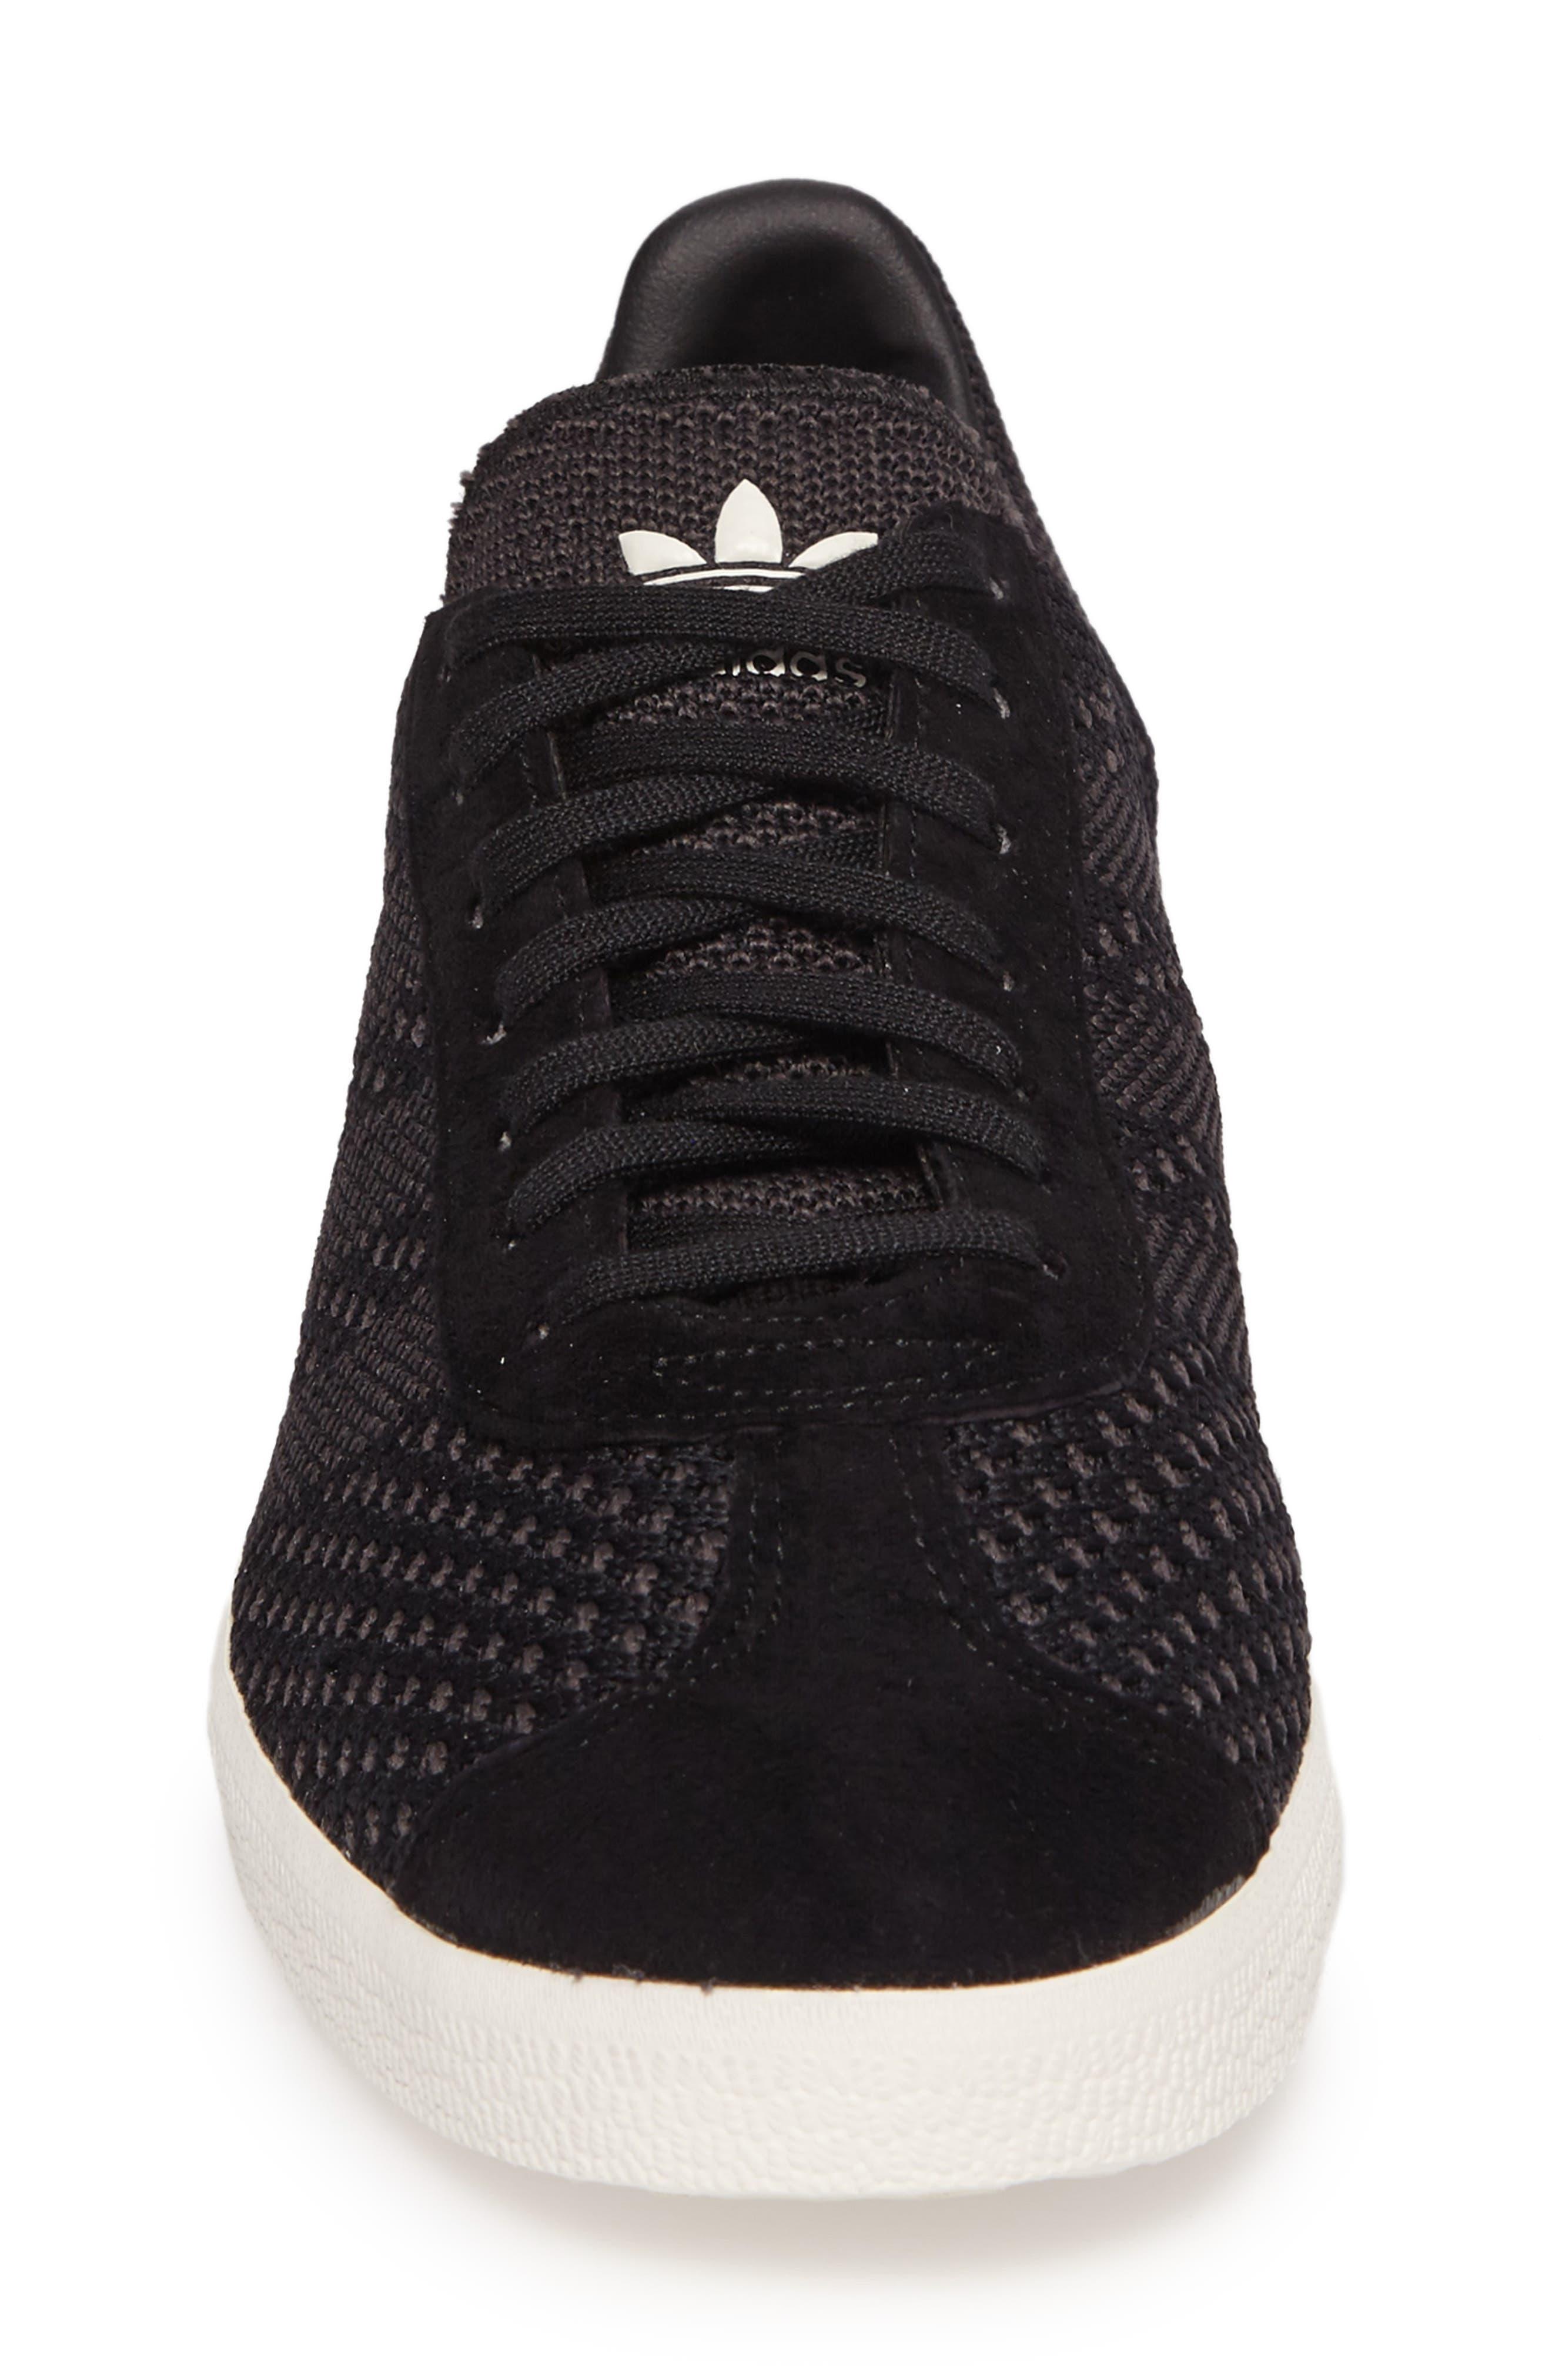 Gazelle Primeknit Sneaker,                             Alternate thumbnail 4, color,                             Core Black/ Off White